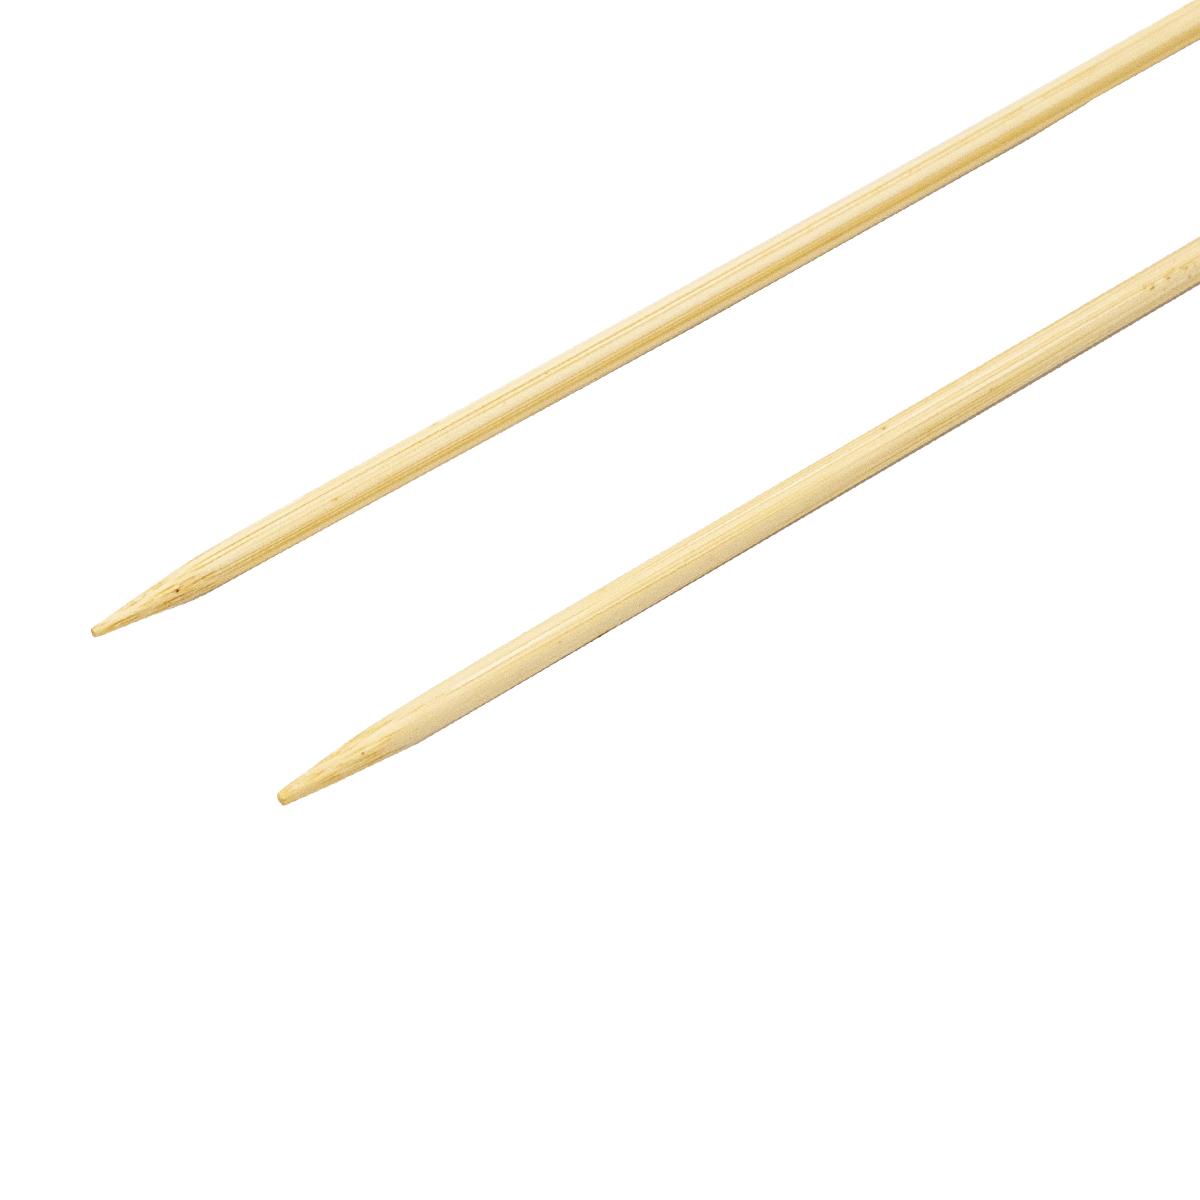 Спицы круговые бамбук 942135, 100 см, 3,5 мм, Hobby&Pro